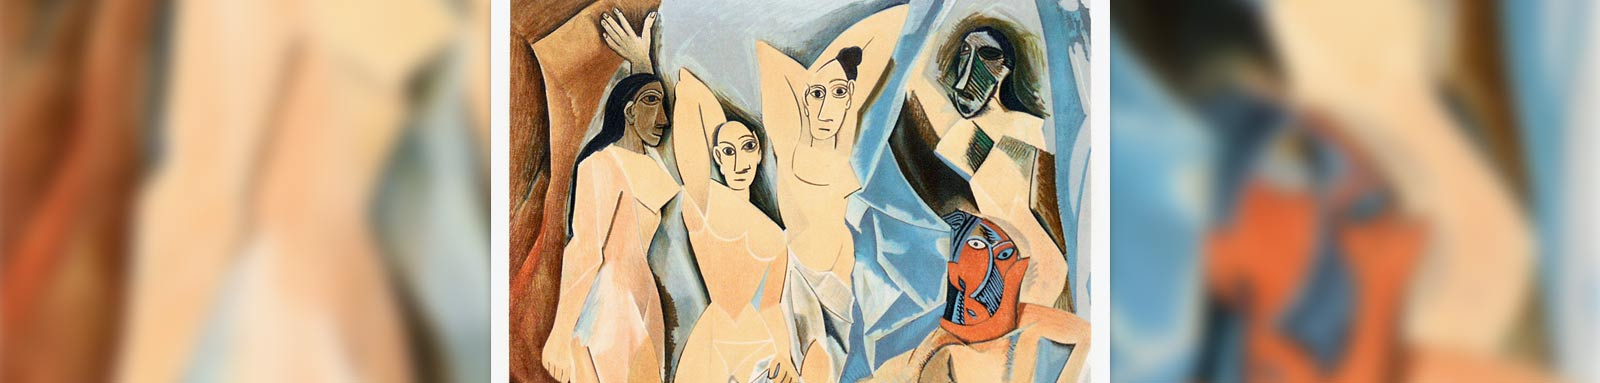 Pablo Picasso Lithographs